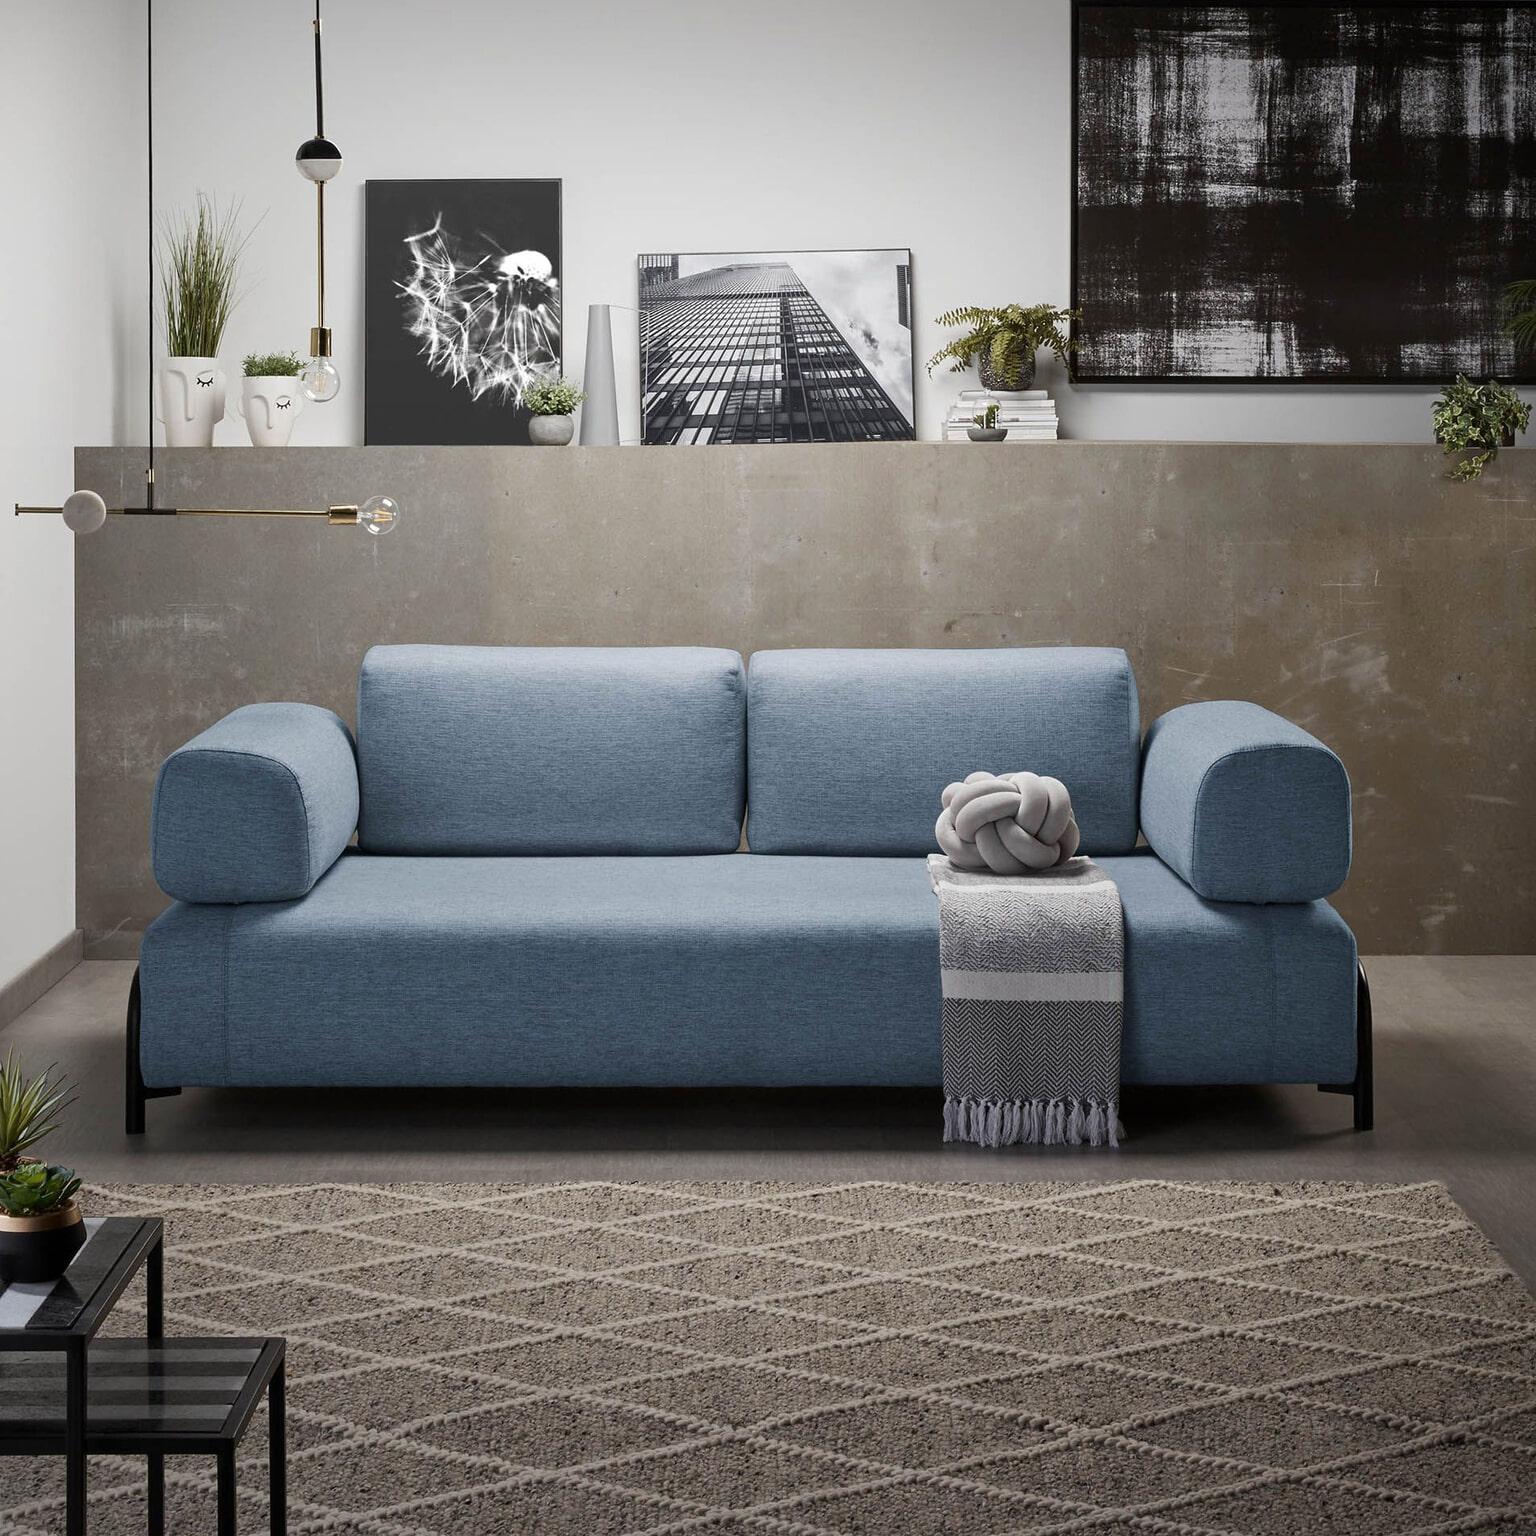 Blauwe Design Bank.Kave Home 3 Zits Bank Compo Kleur Blauw S589bb26 Meubelpartner